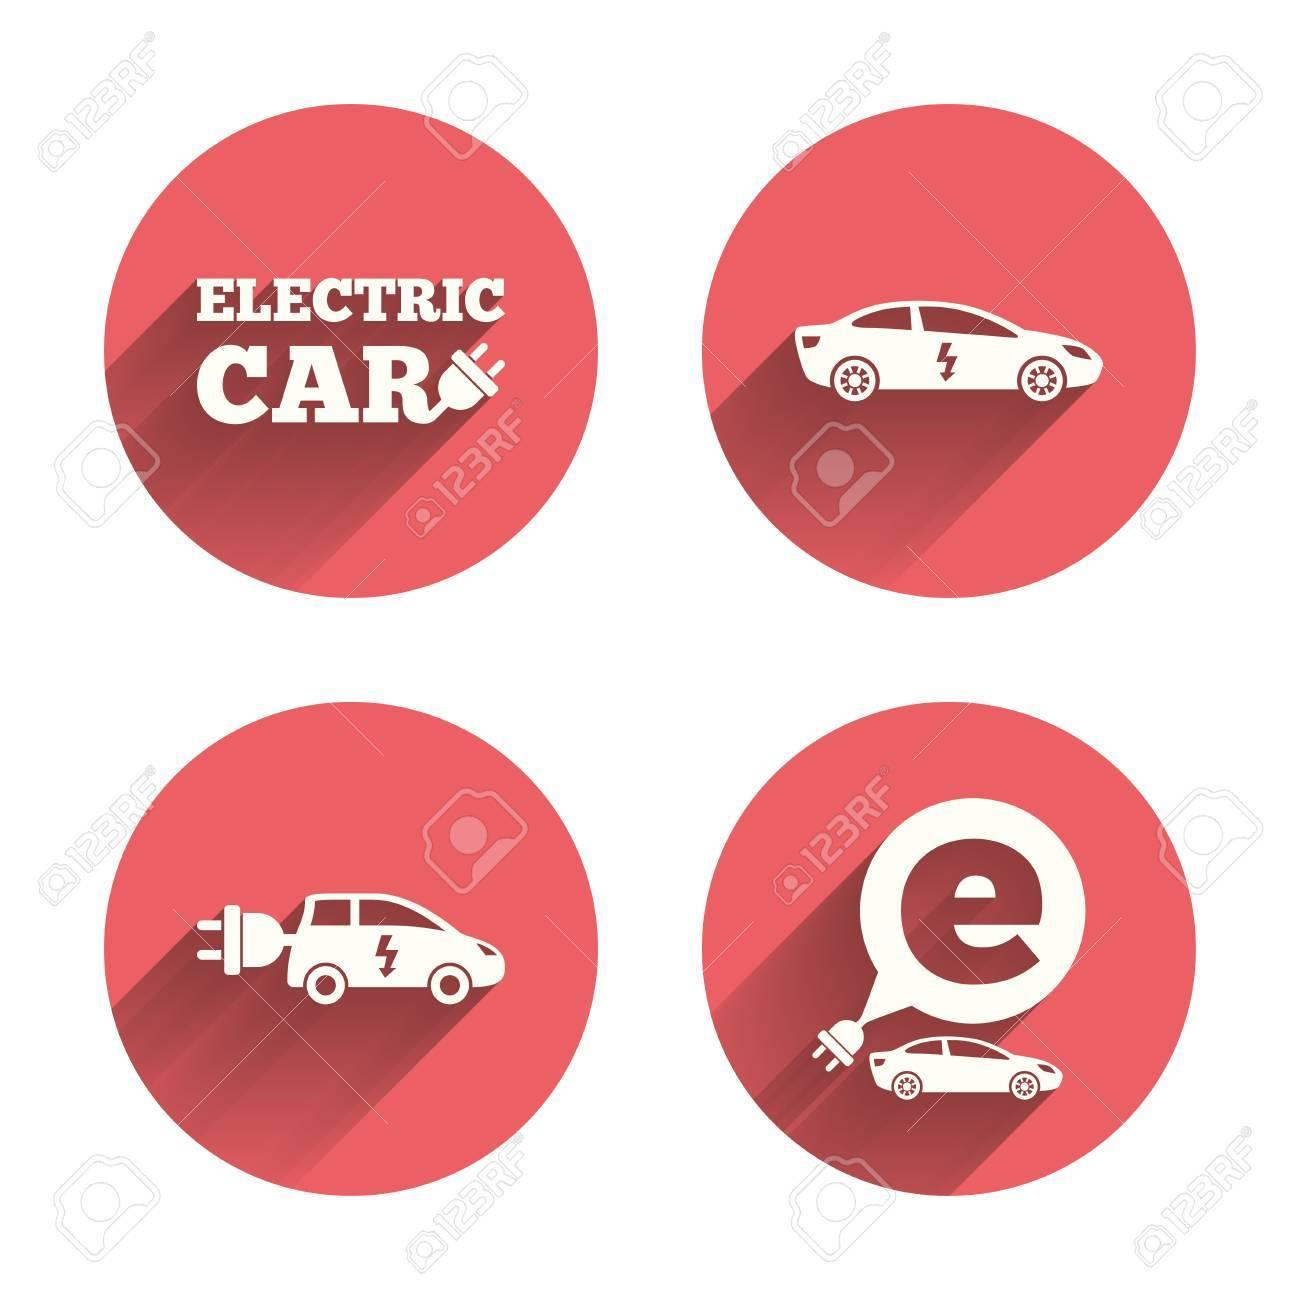 Electric Car Icons Sedan And Hatchback Transport Symbols Eco